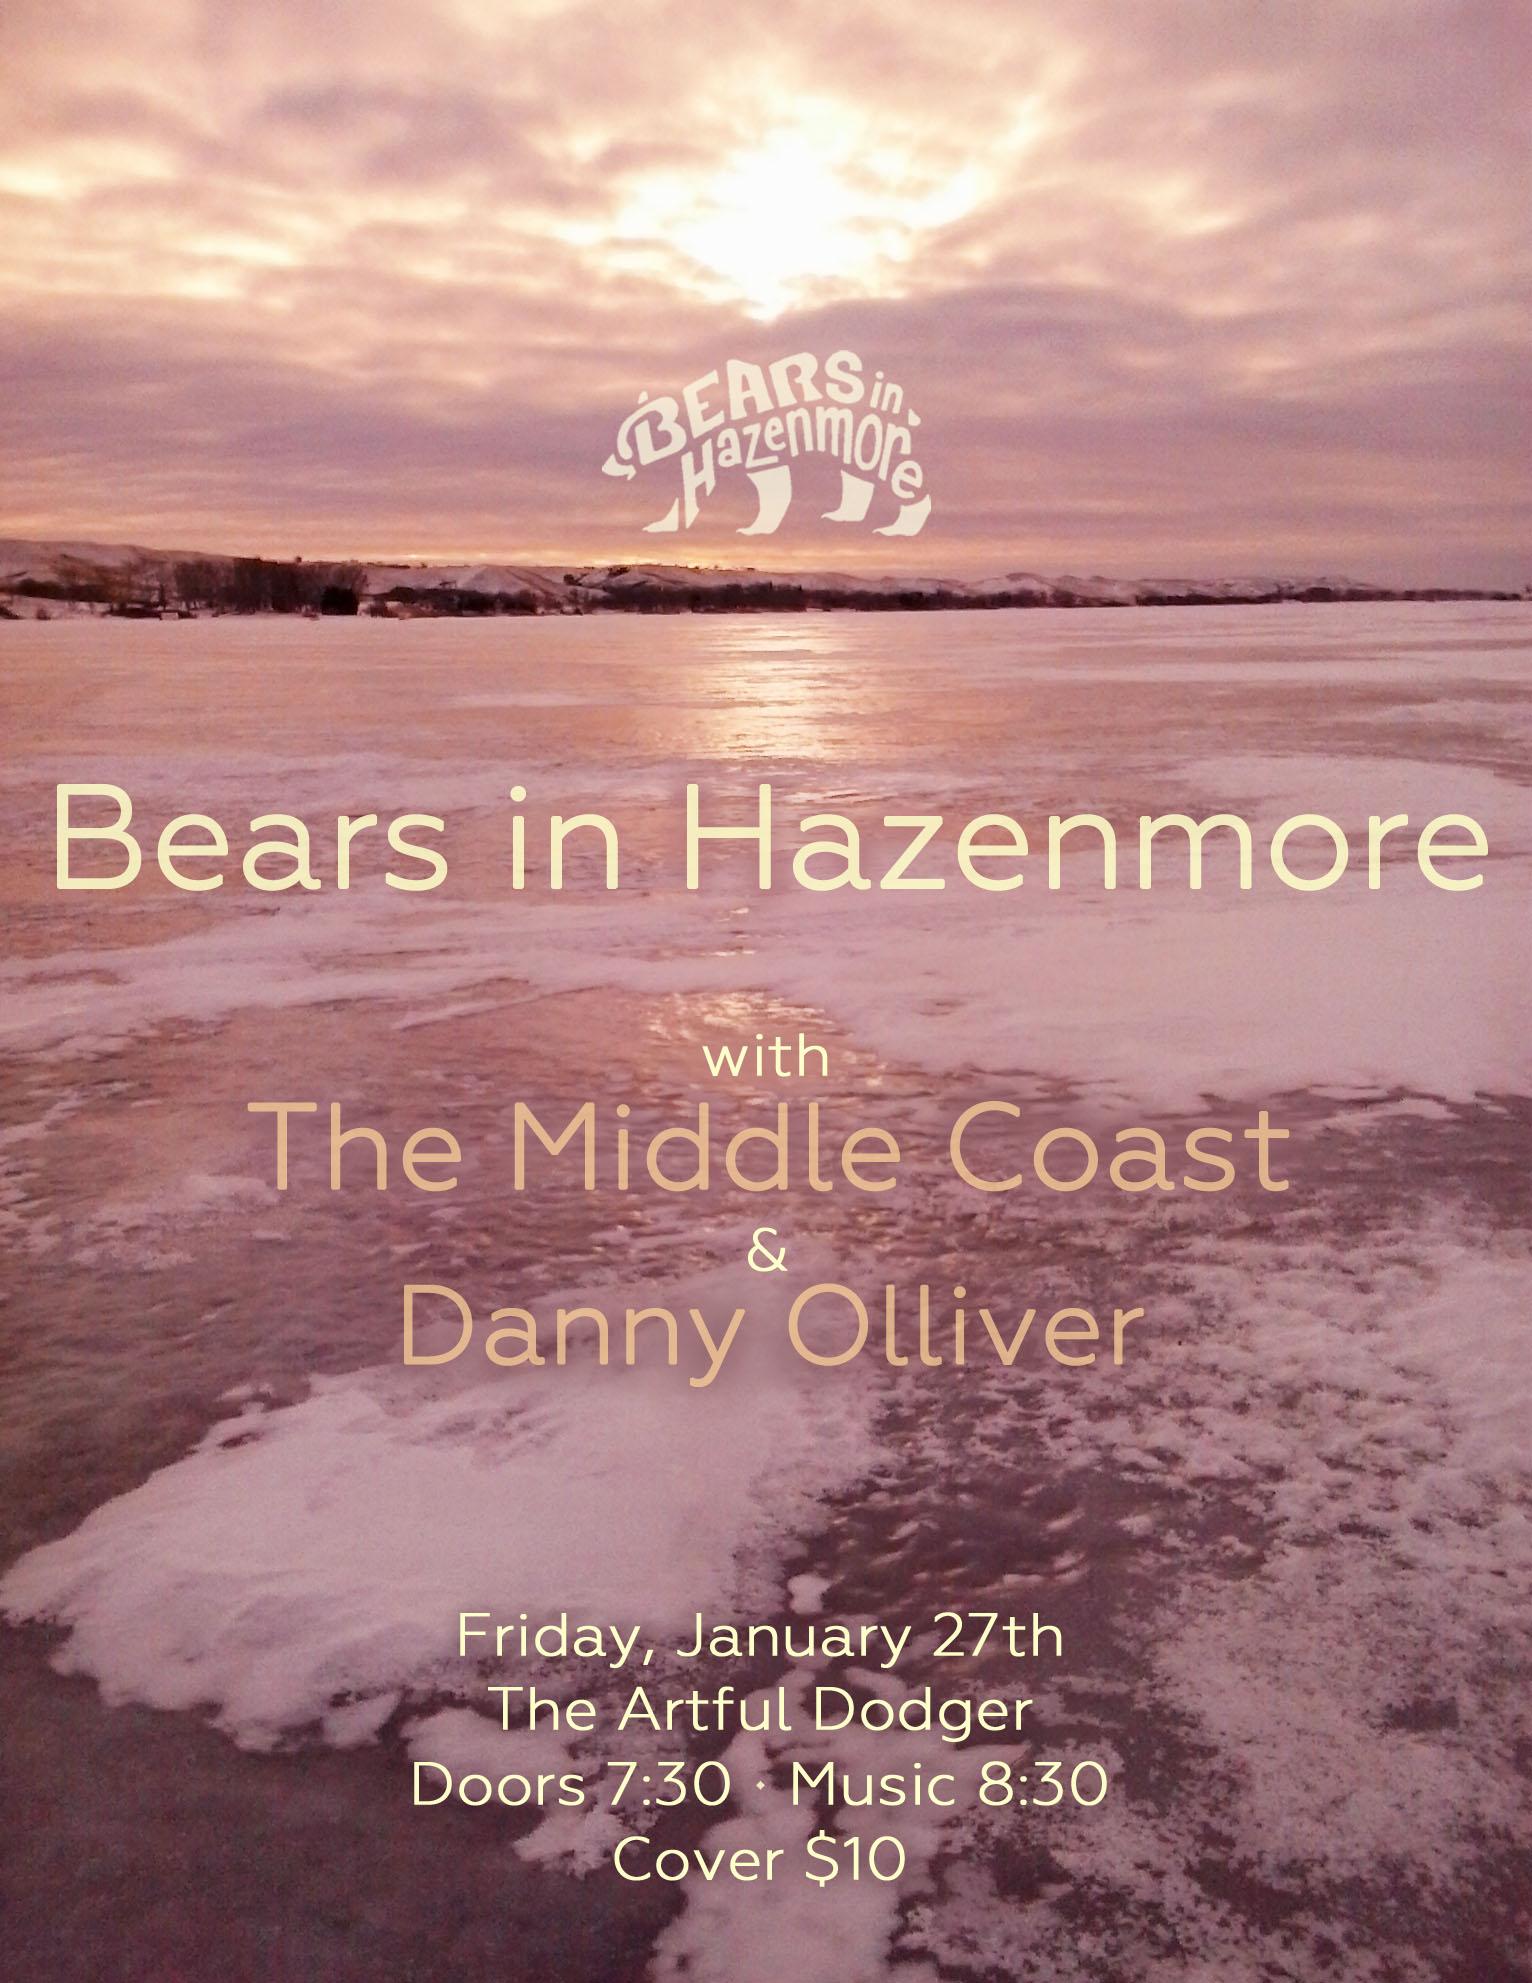 Bears in Hazenmore Poster, Jan 2017